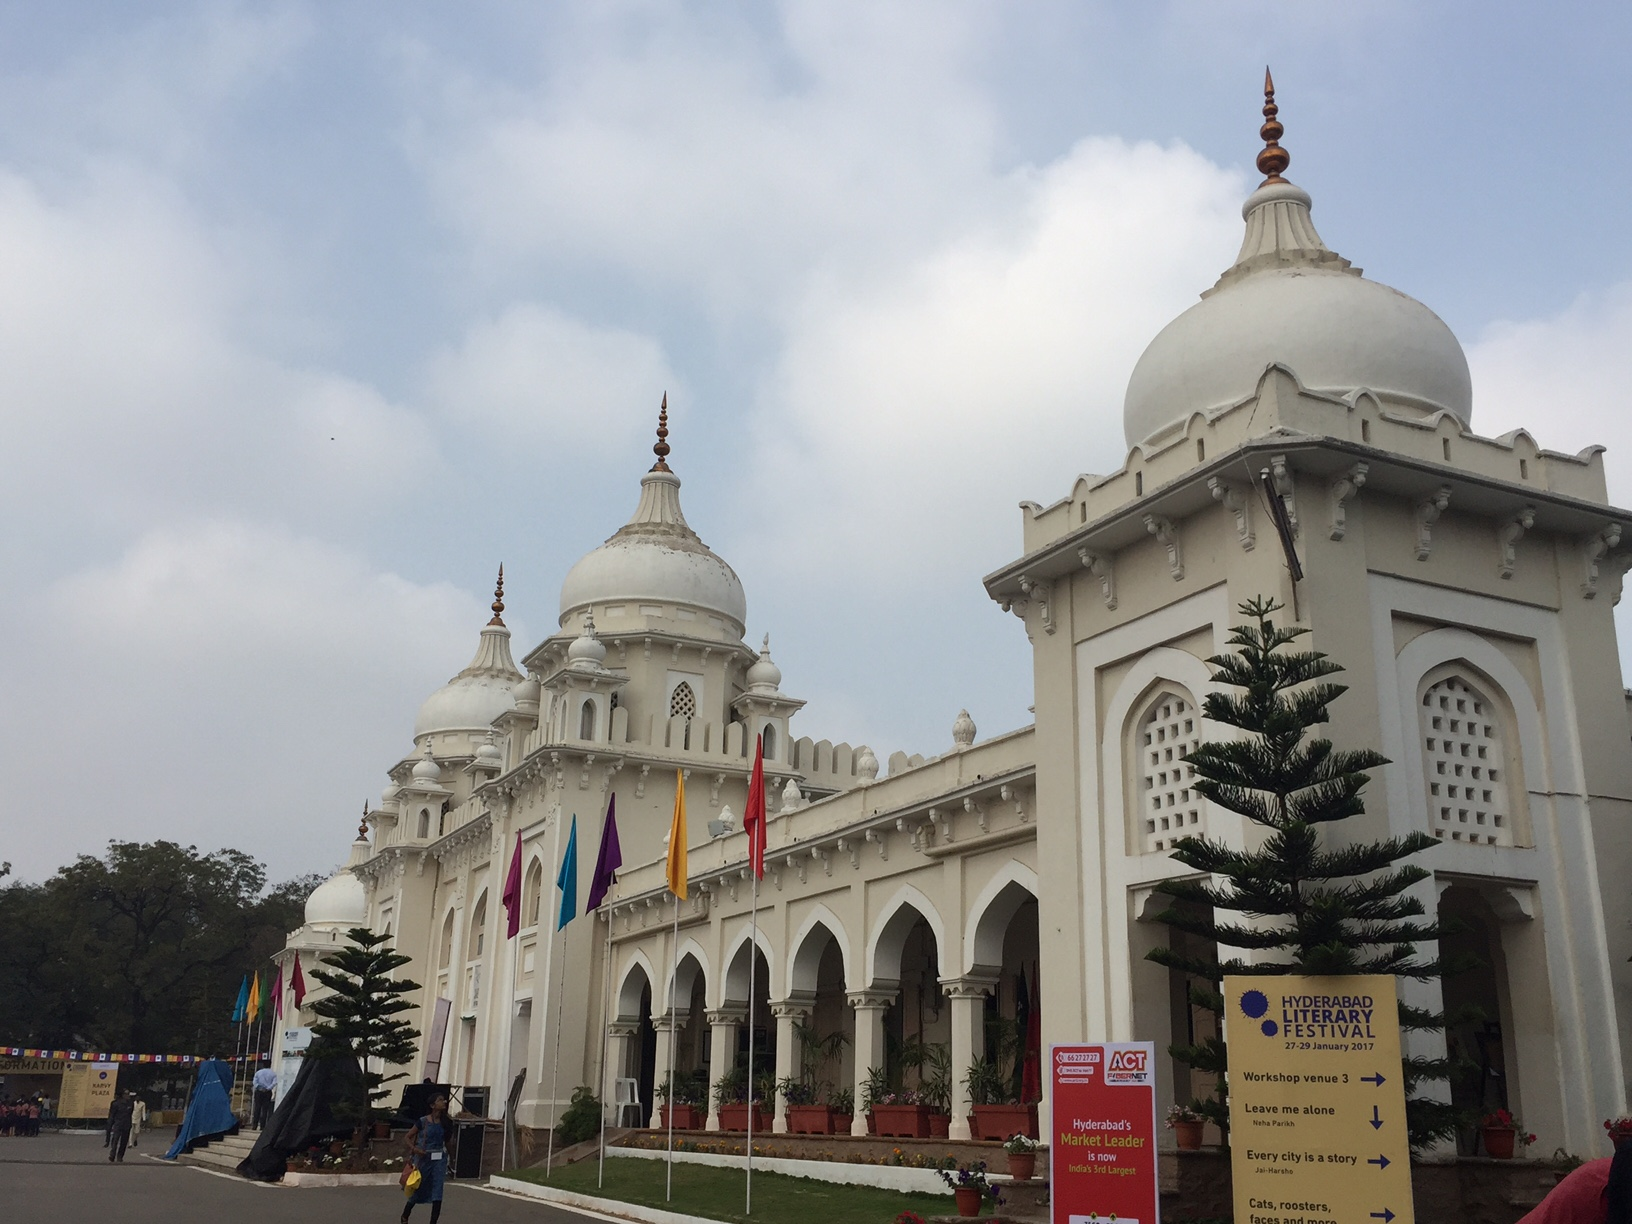 hyderabad-literary-festival-venue